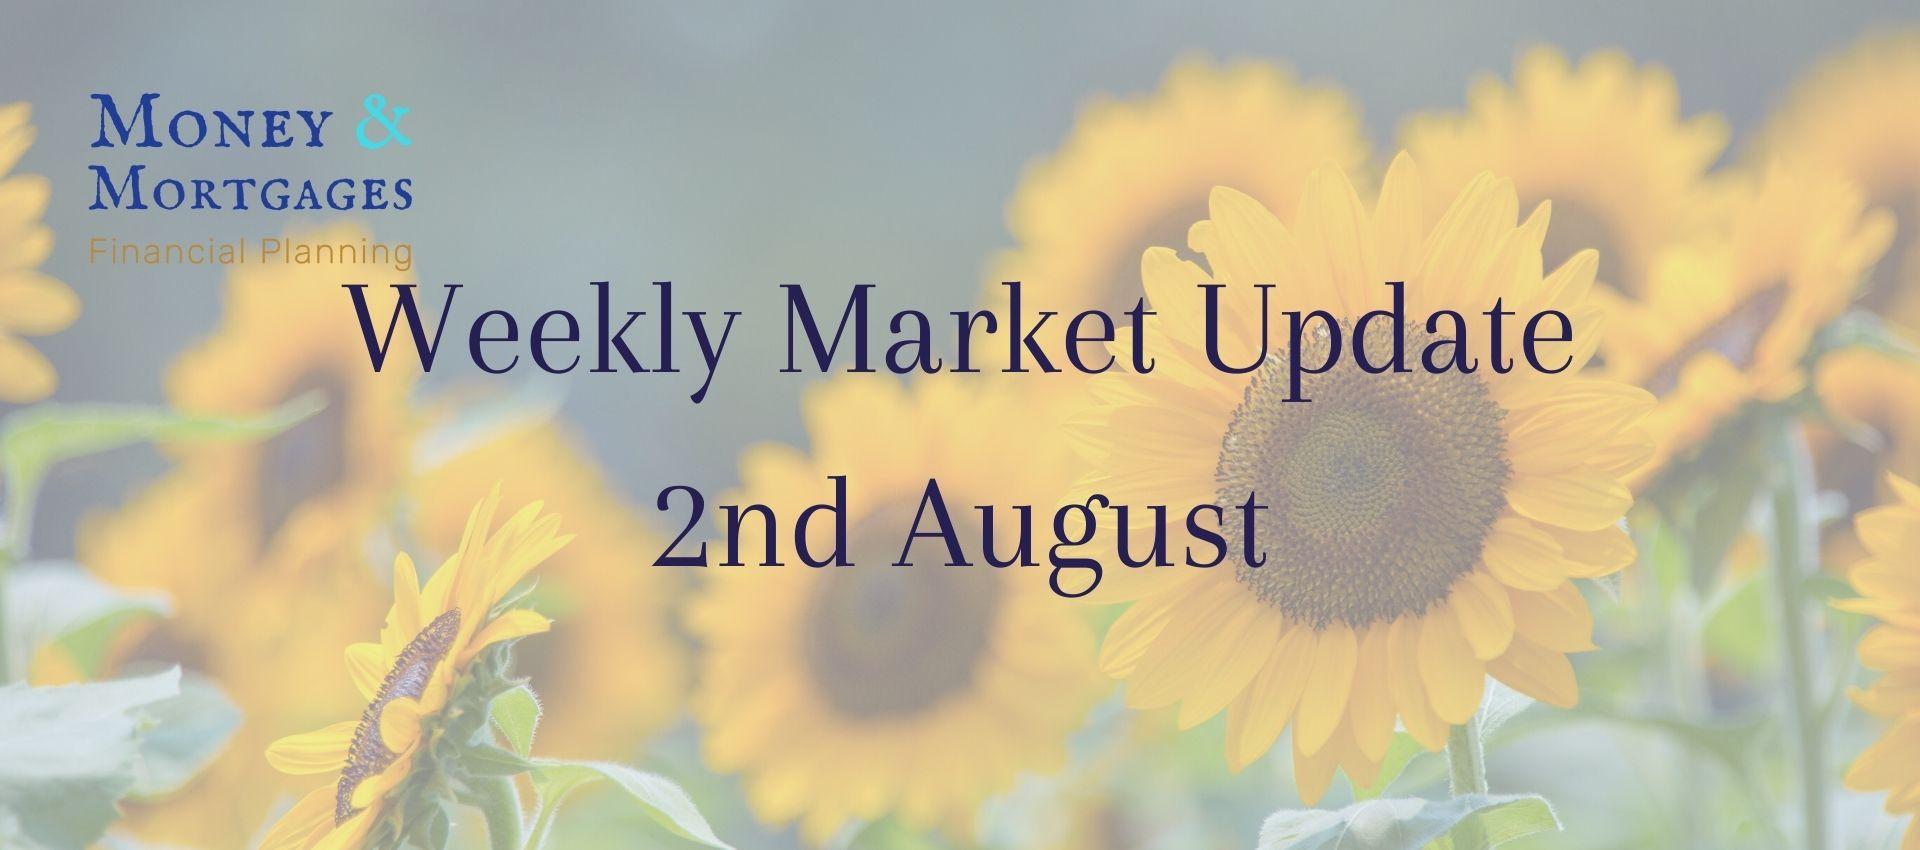 2nd August stock market update